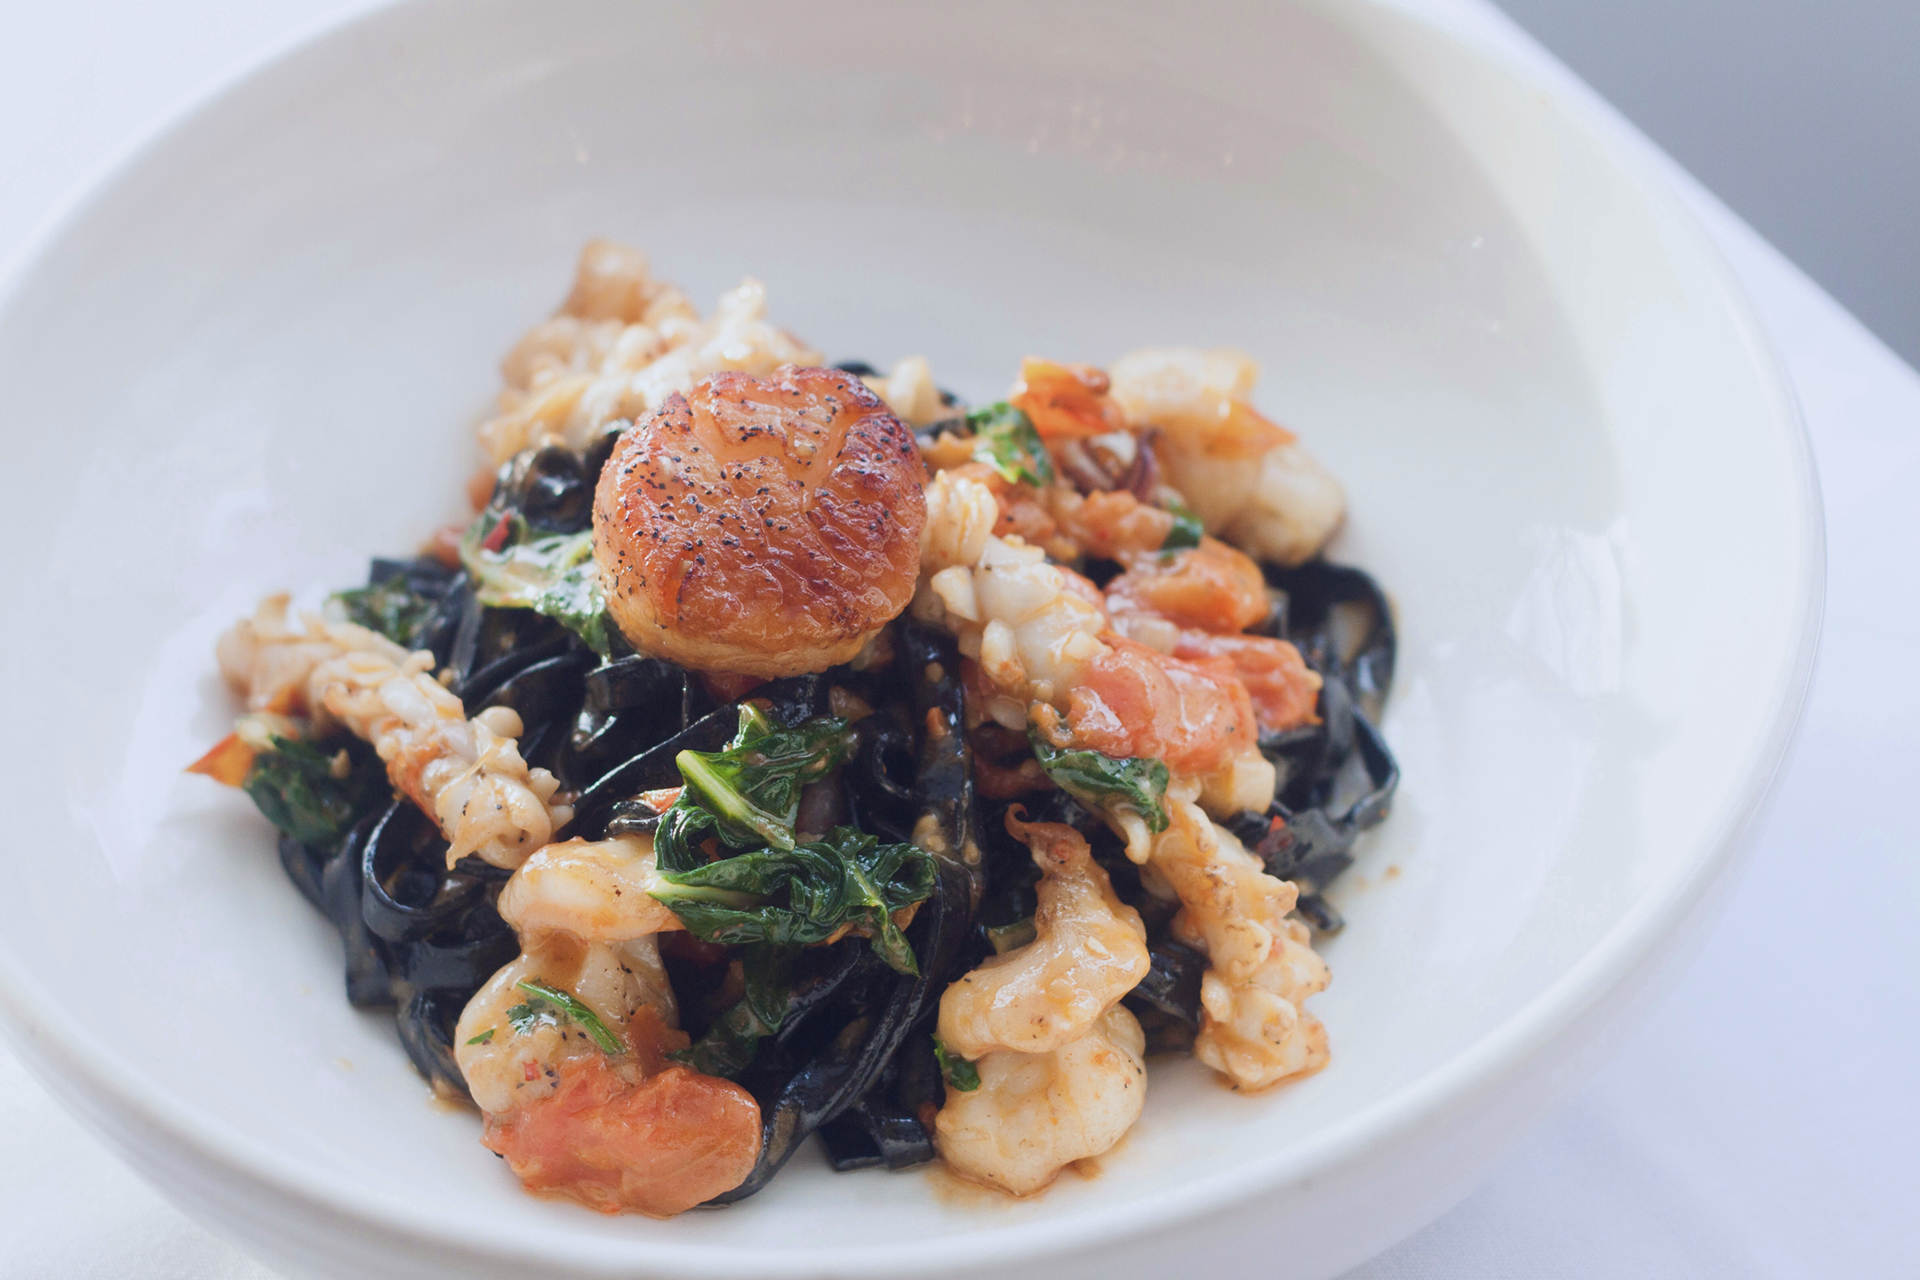 A squid ink pasta dish served at Ristorante Beatrice.